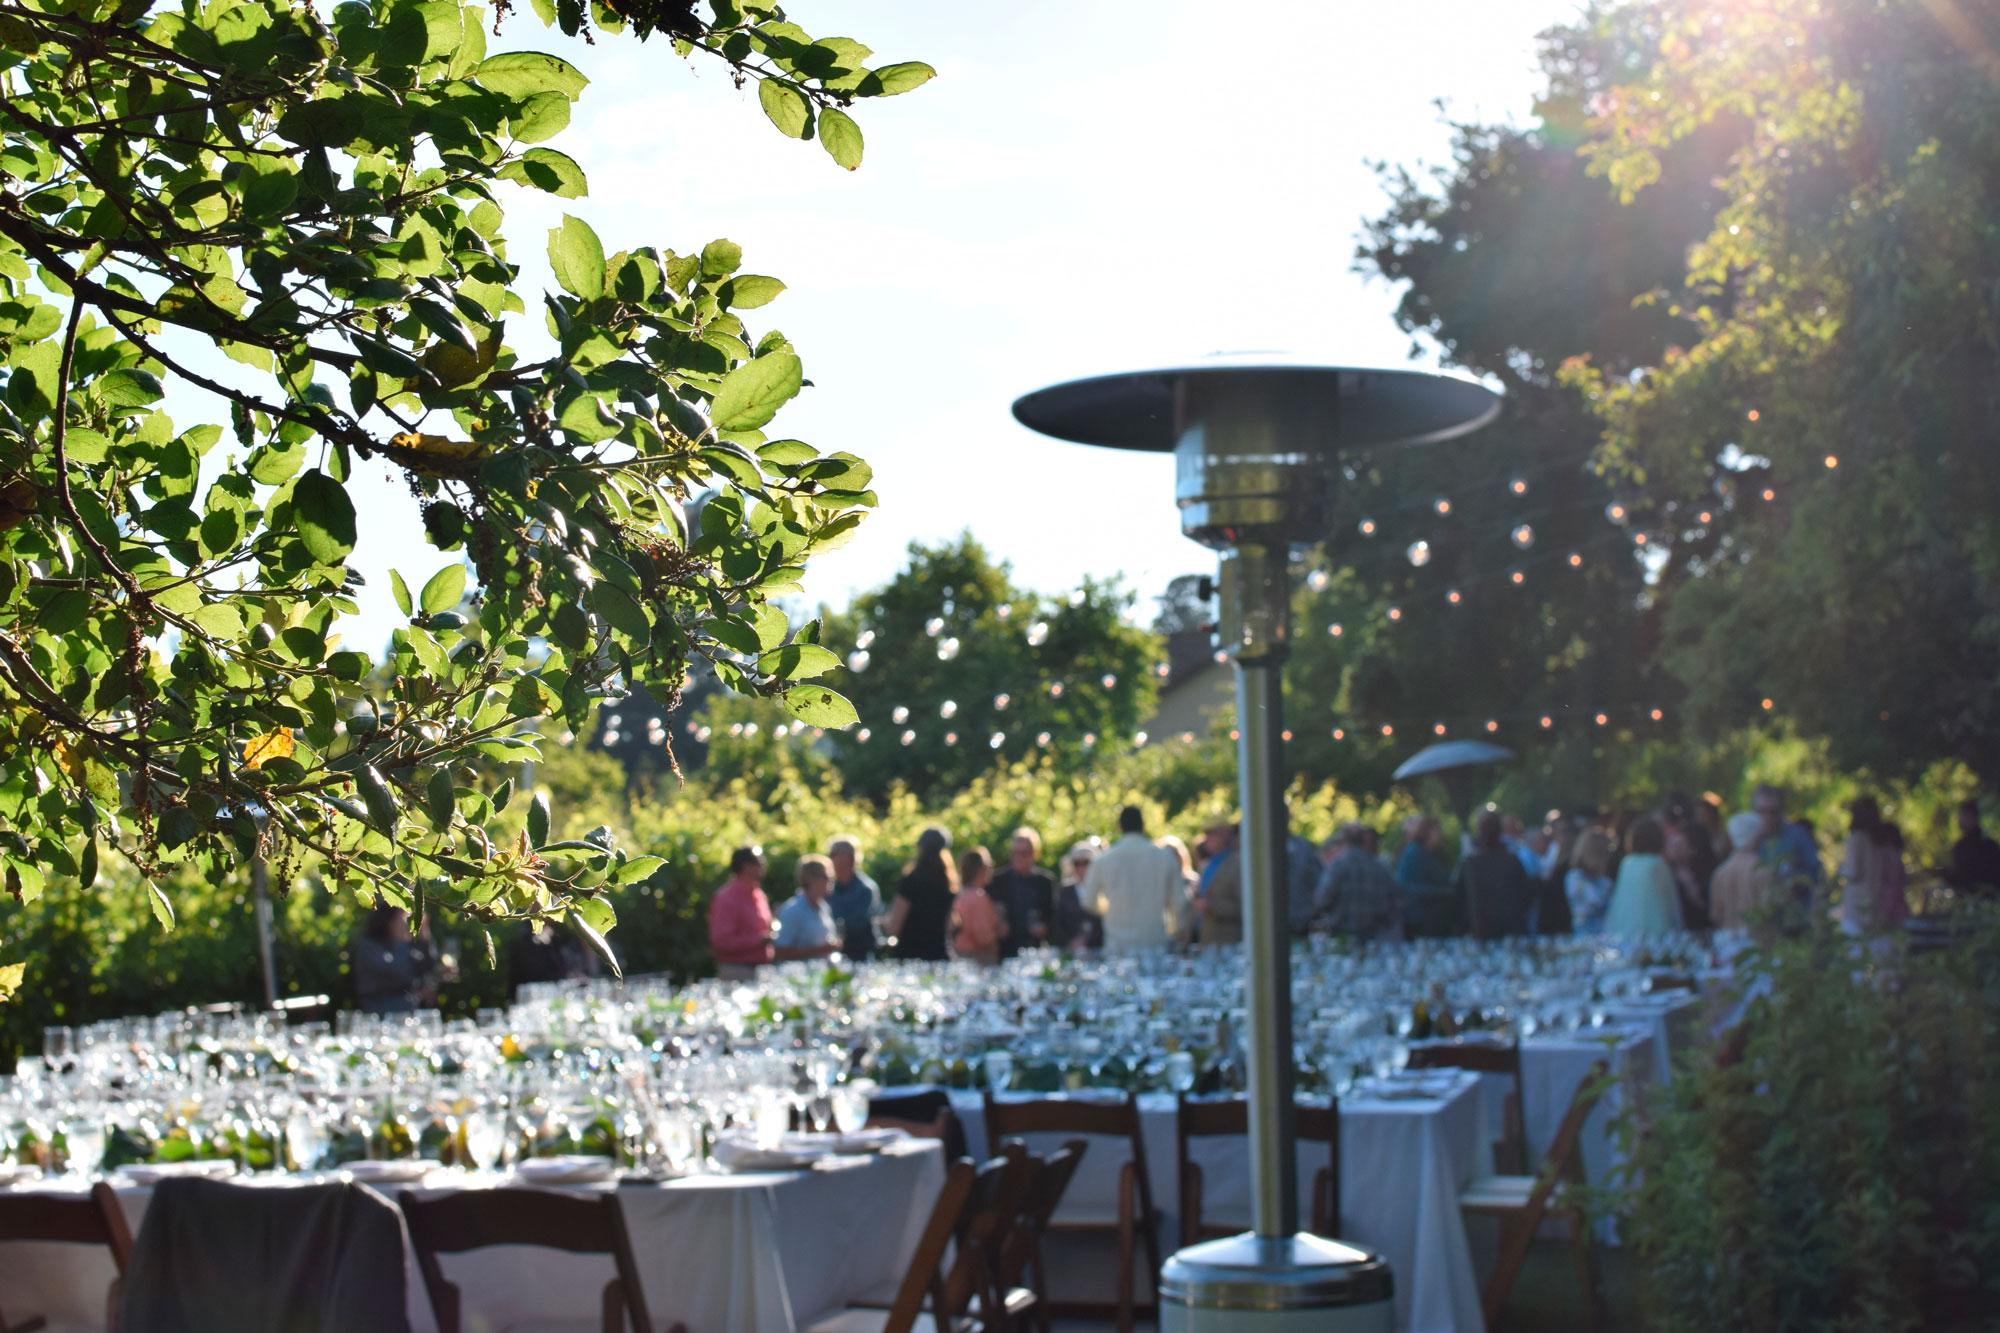 winemakers-dinner-setup-horizontal.jpg